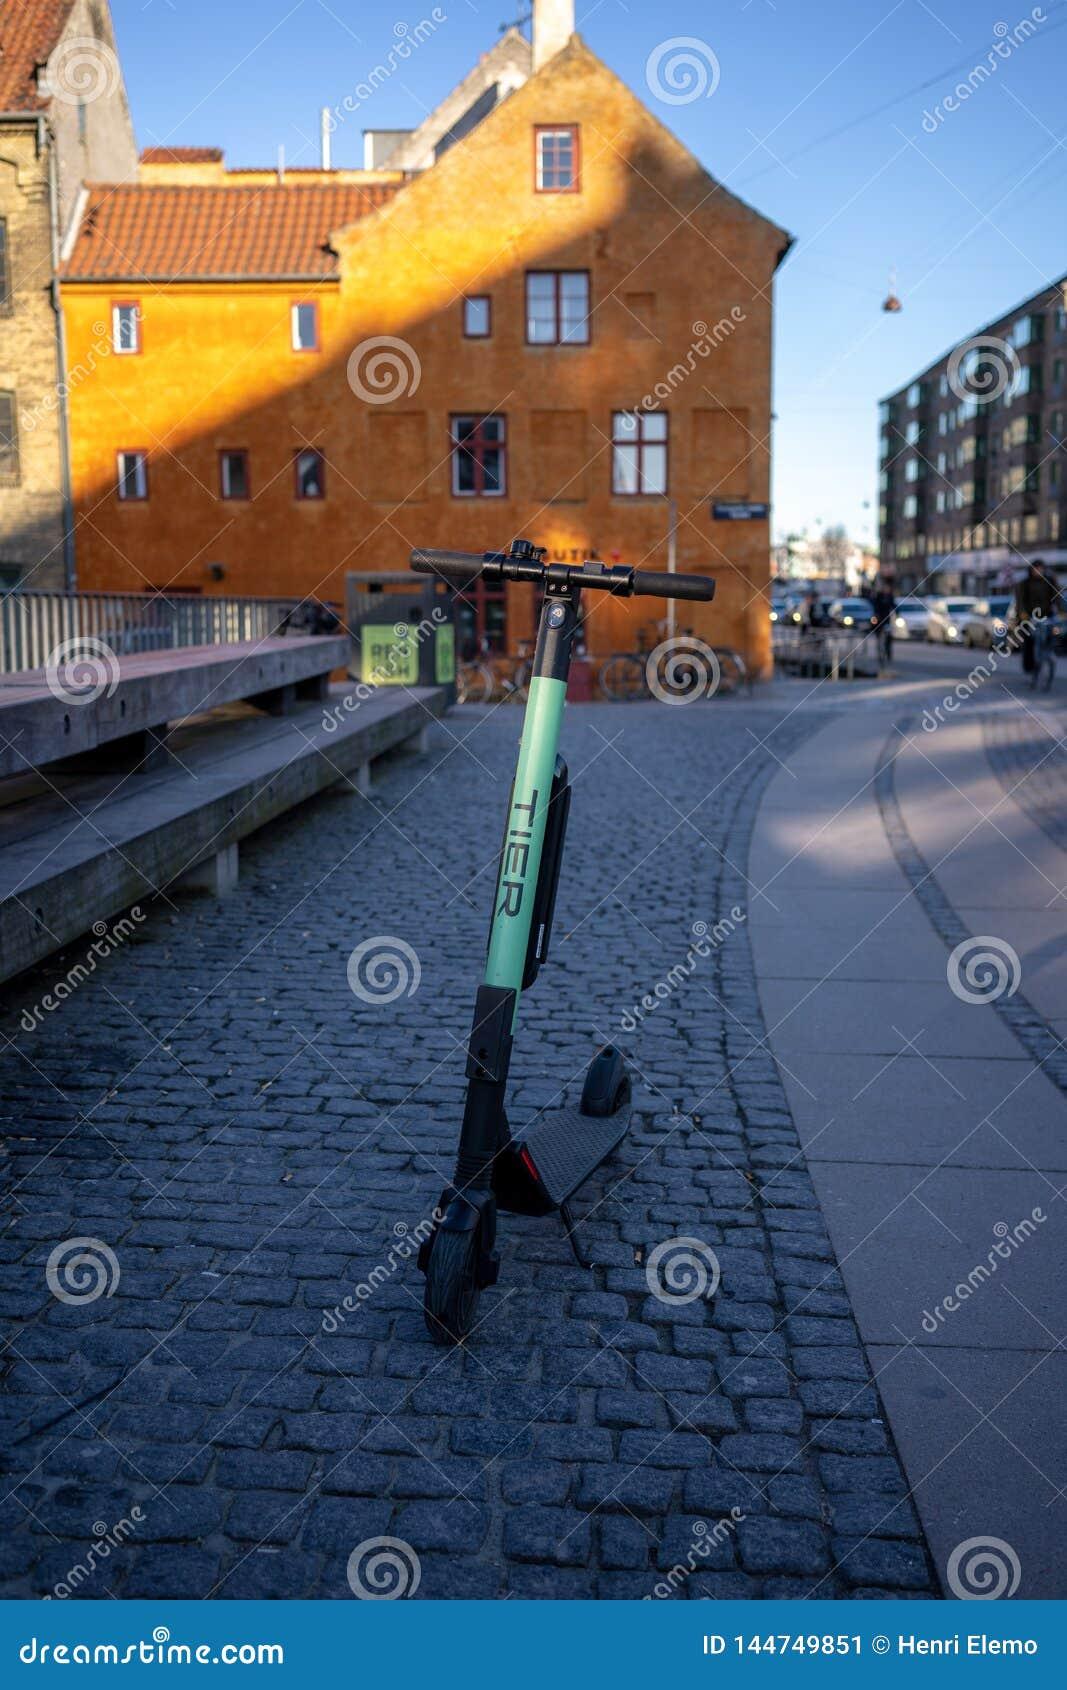 Copenhagen, Denmark - April 1, 2019: Electric scooter from Tier in Copenhagen on morning sun, next to iconic houses in Copenhagen